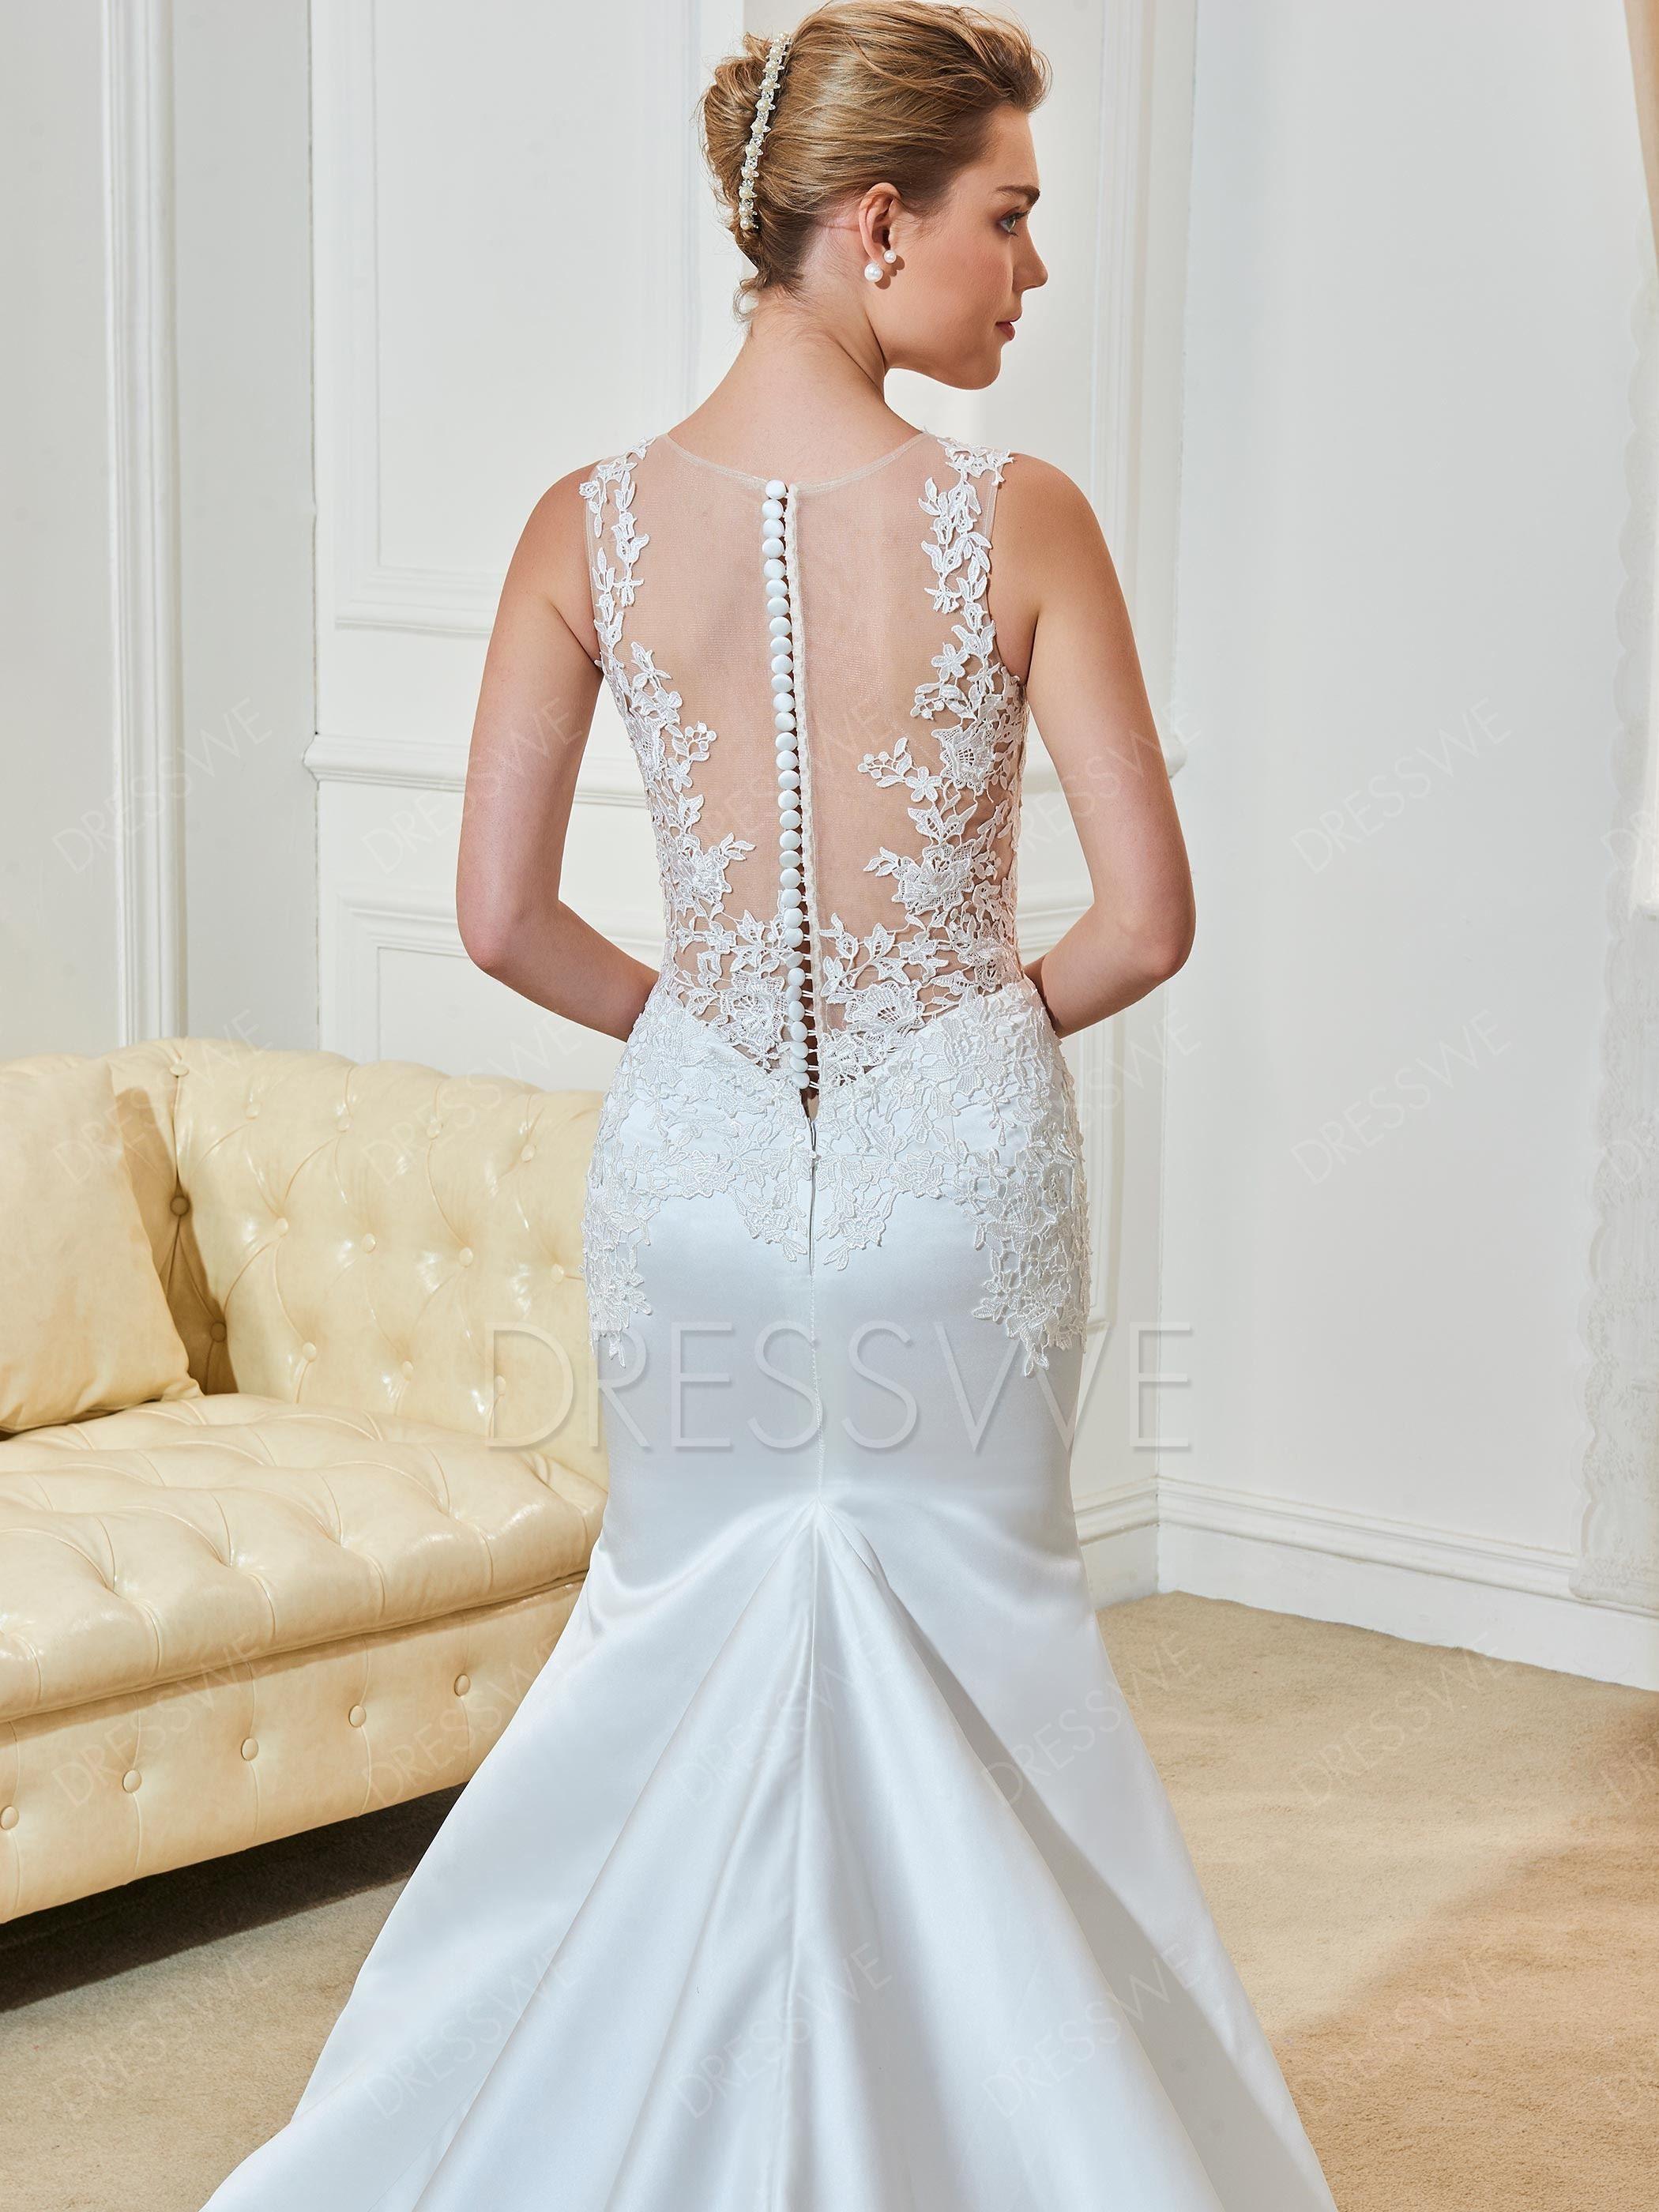 Mermaid dress wedding  Appliuqes Button Mermaid Wedding Dress  Pinterest  Mermaid wedding